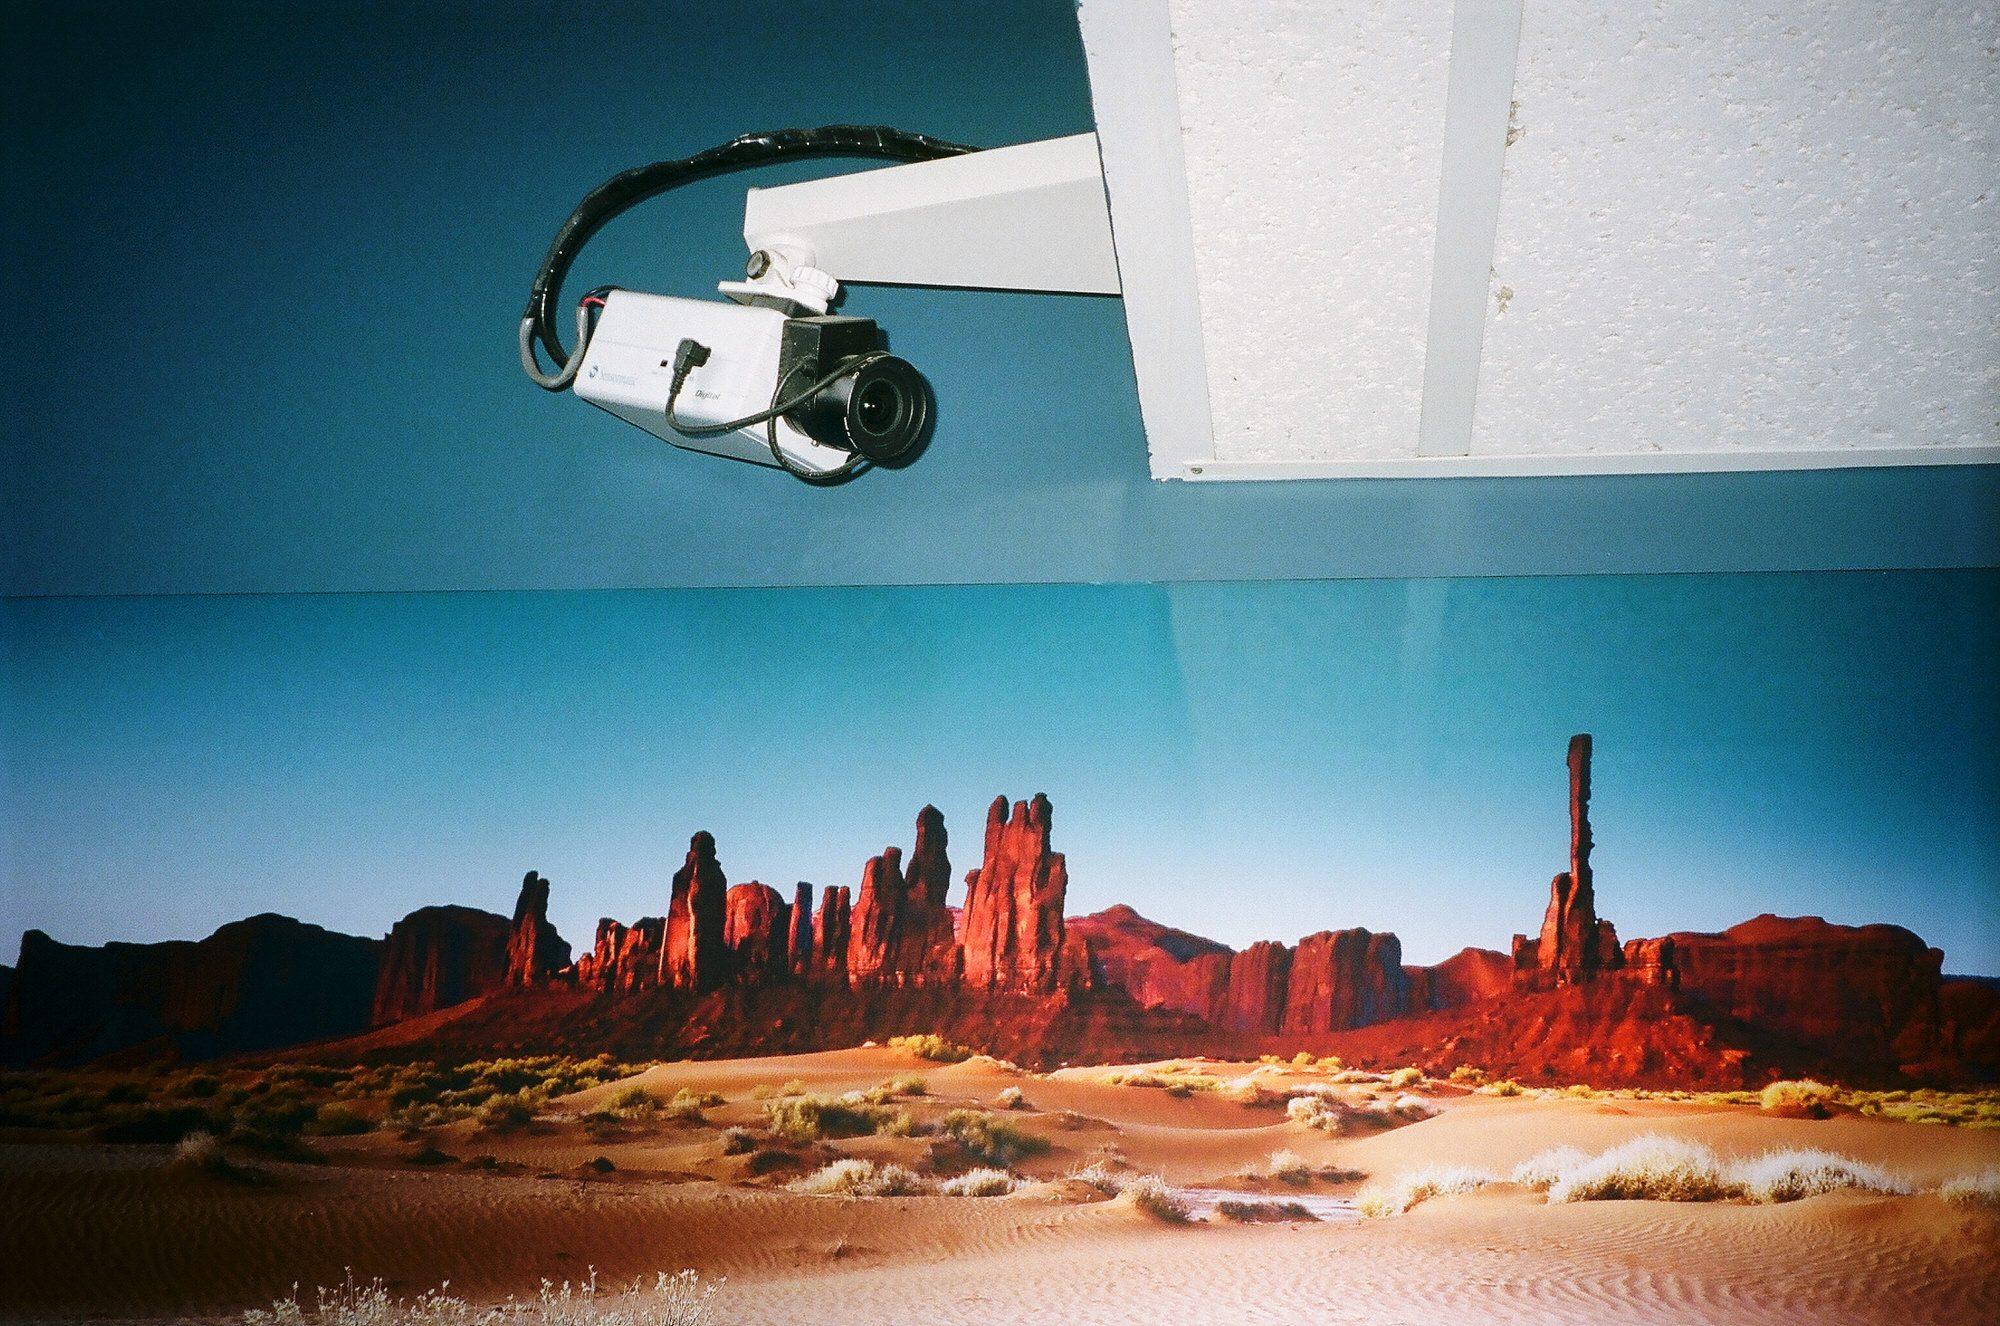 eric-kim-street-photography-surveillance